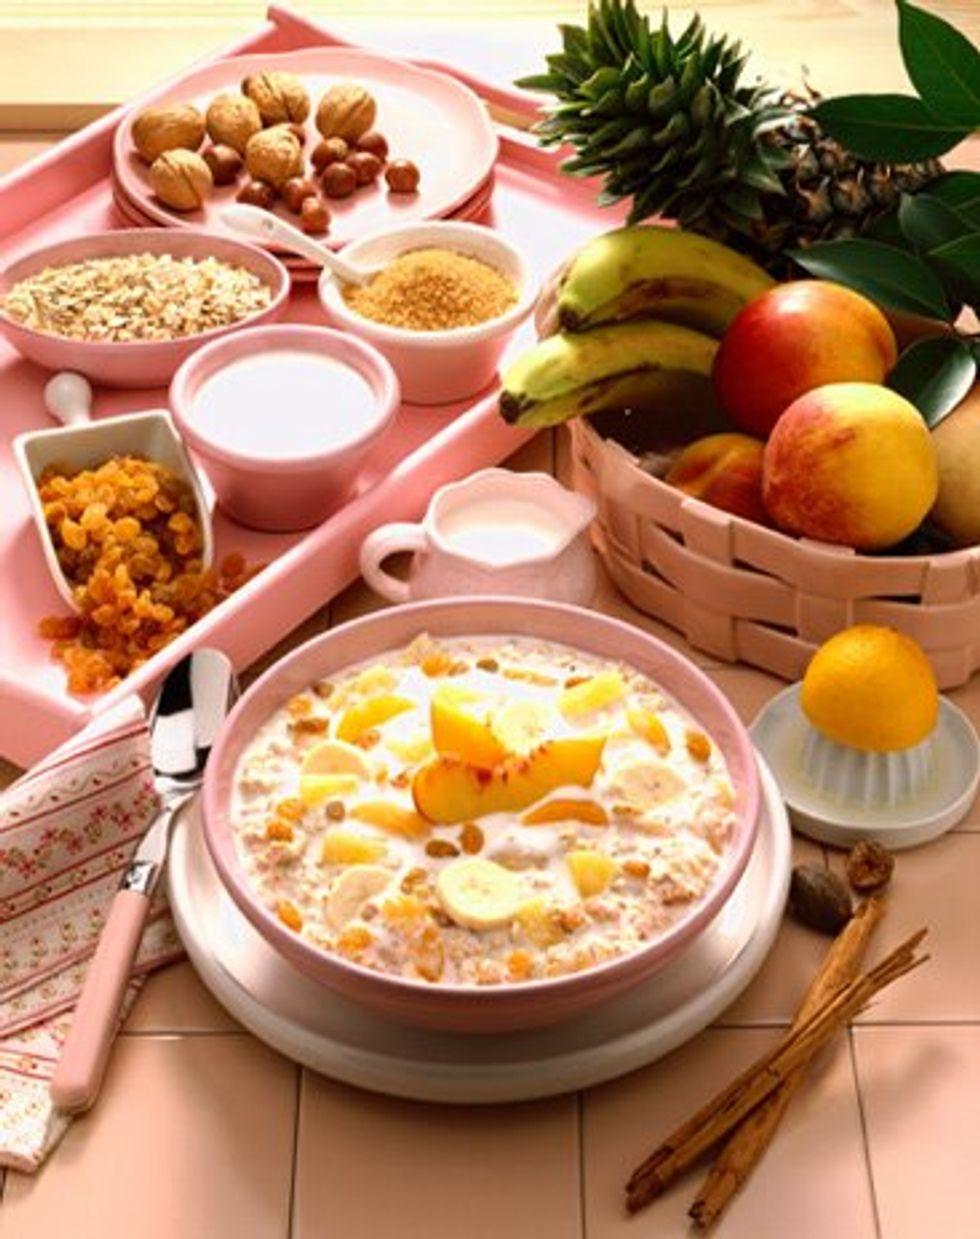 cereal-fun-breakfast-787084.jpg